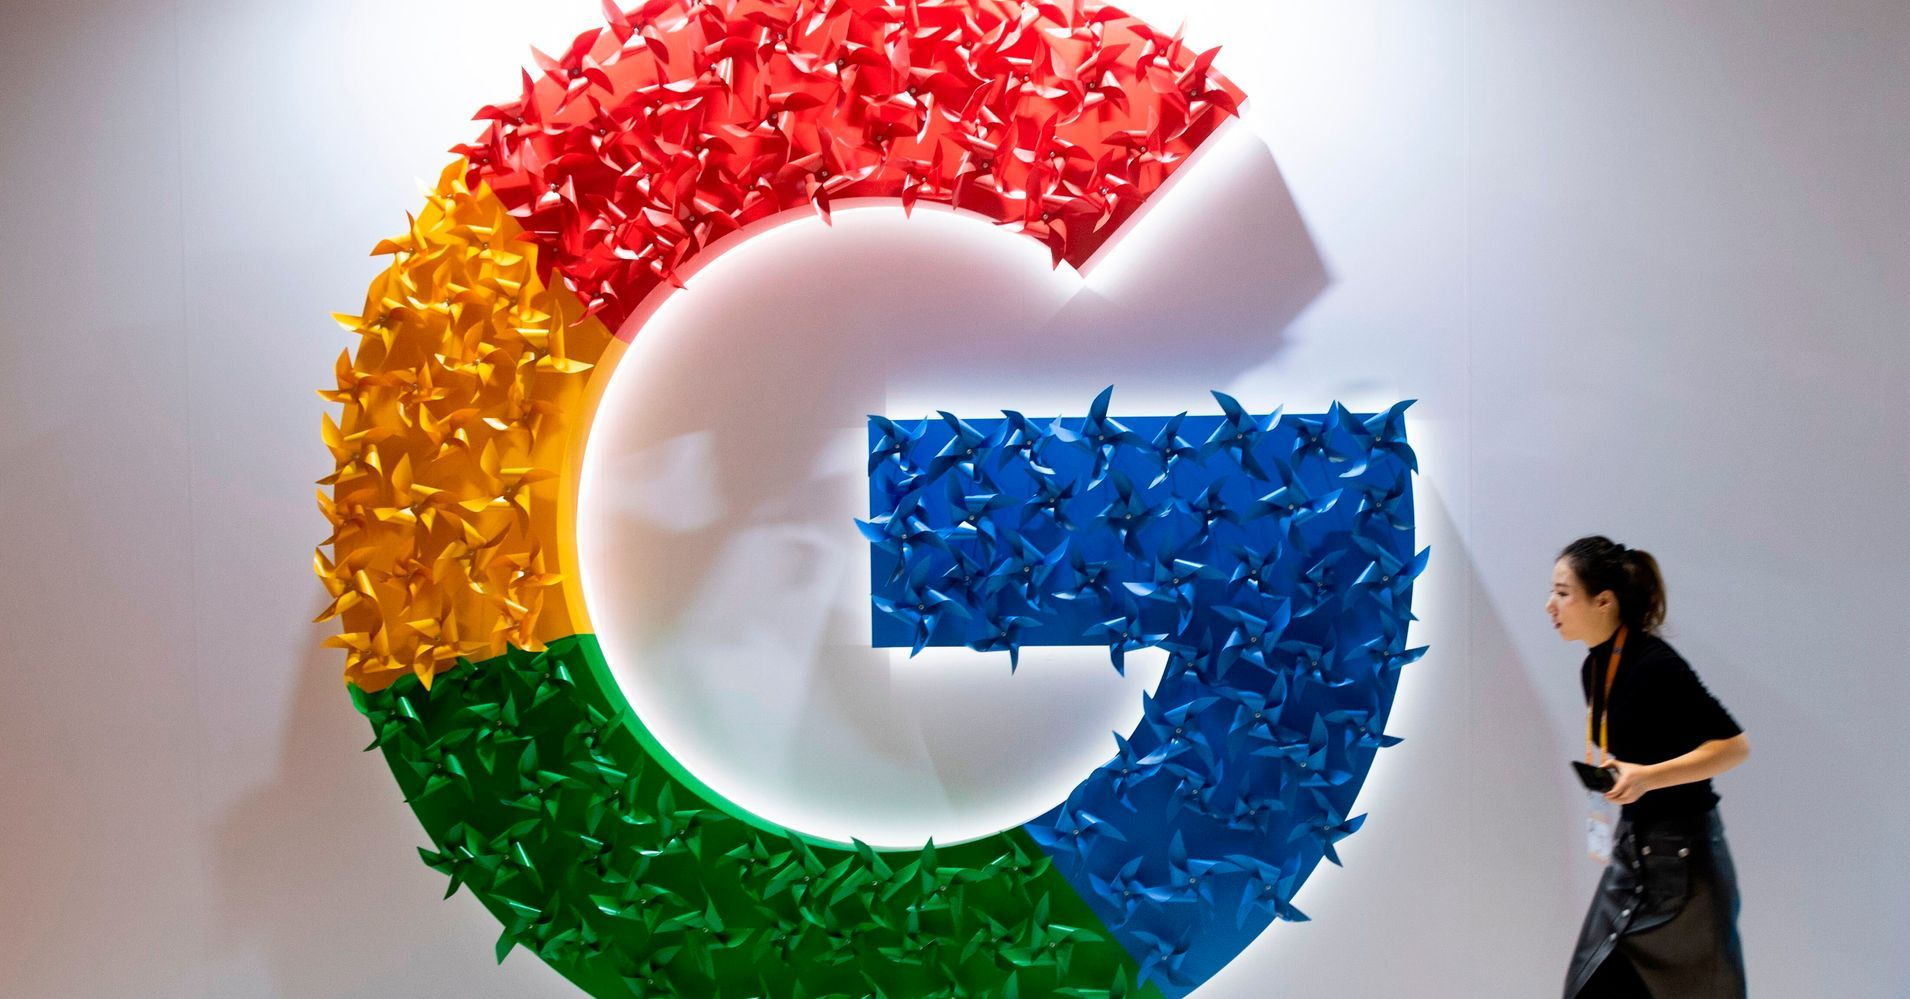 DOJ Preparing Google Antitrust Probe, Sources Say